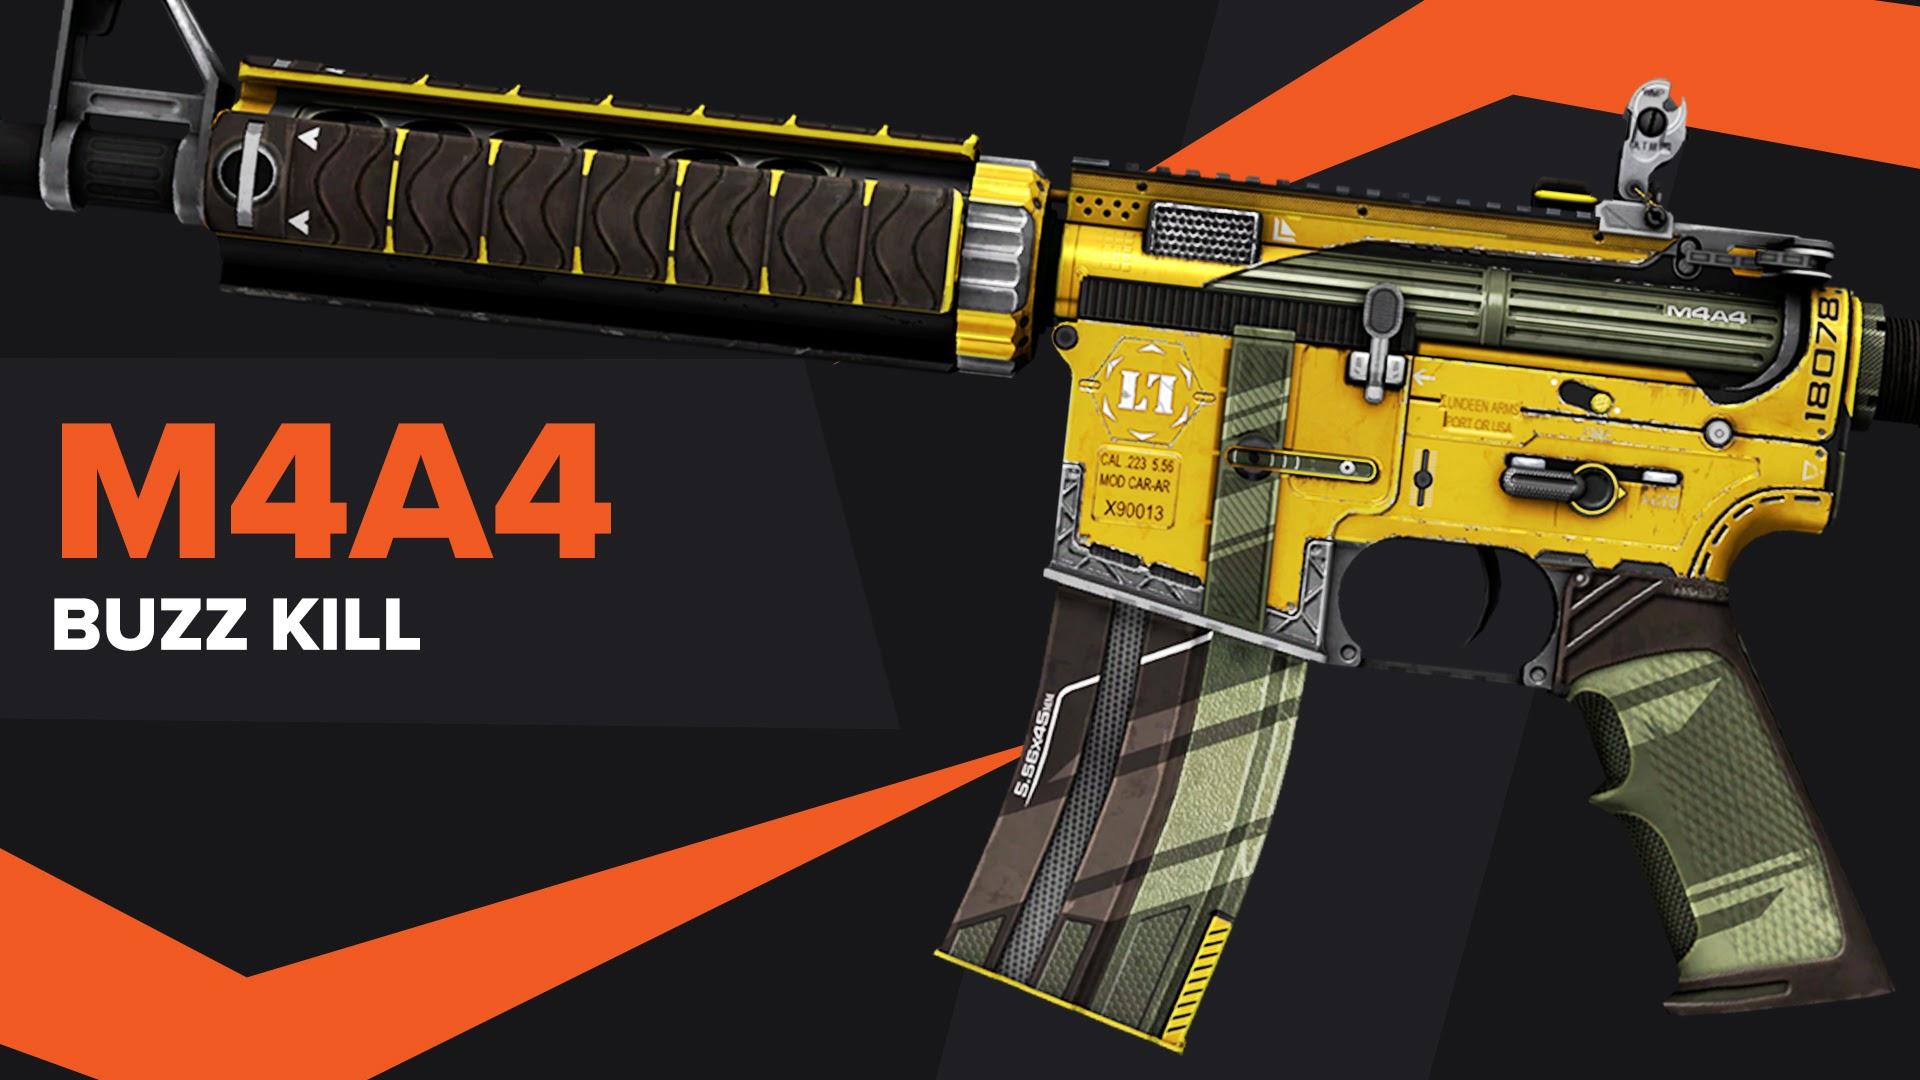 Buzz Kill CSGO Skin M4A4